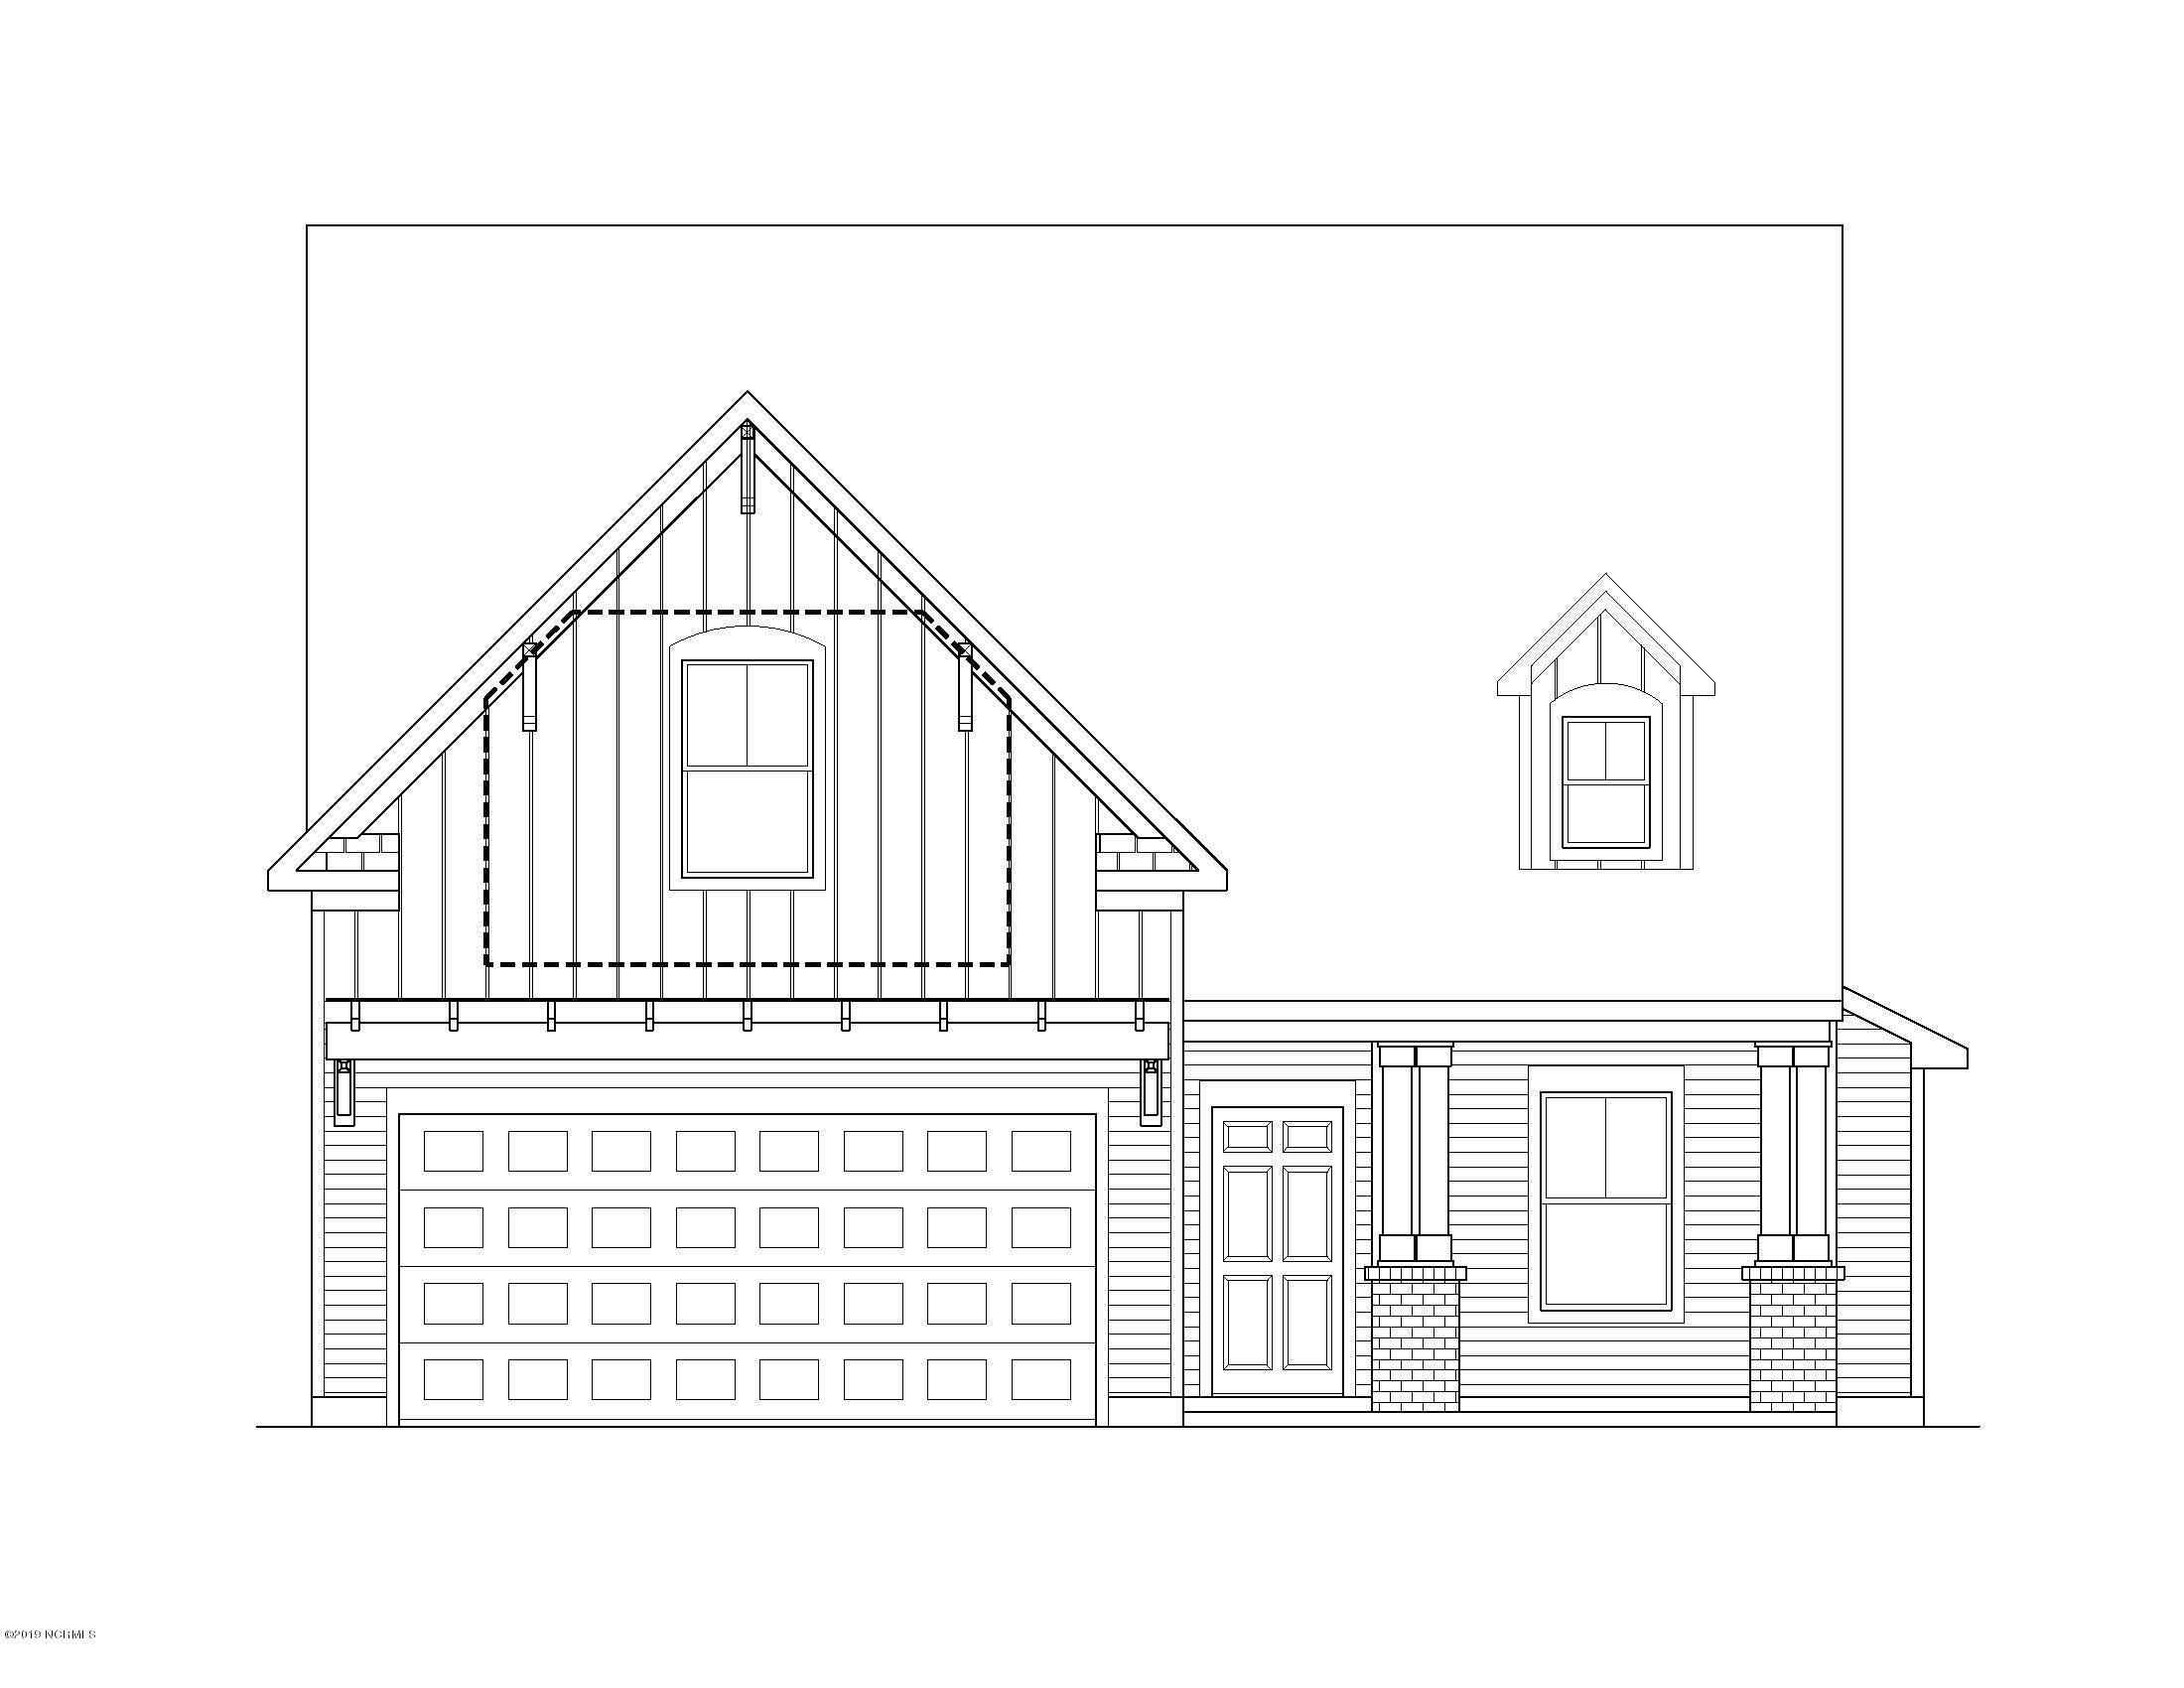 Carolina Plantations Real Estate - MLS Number: 100144465